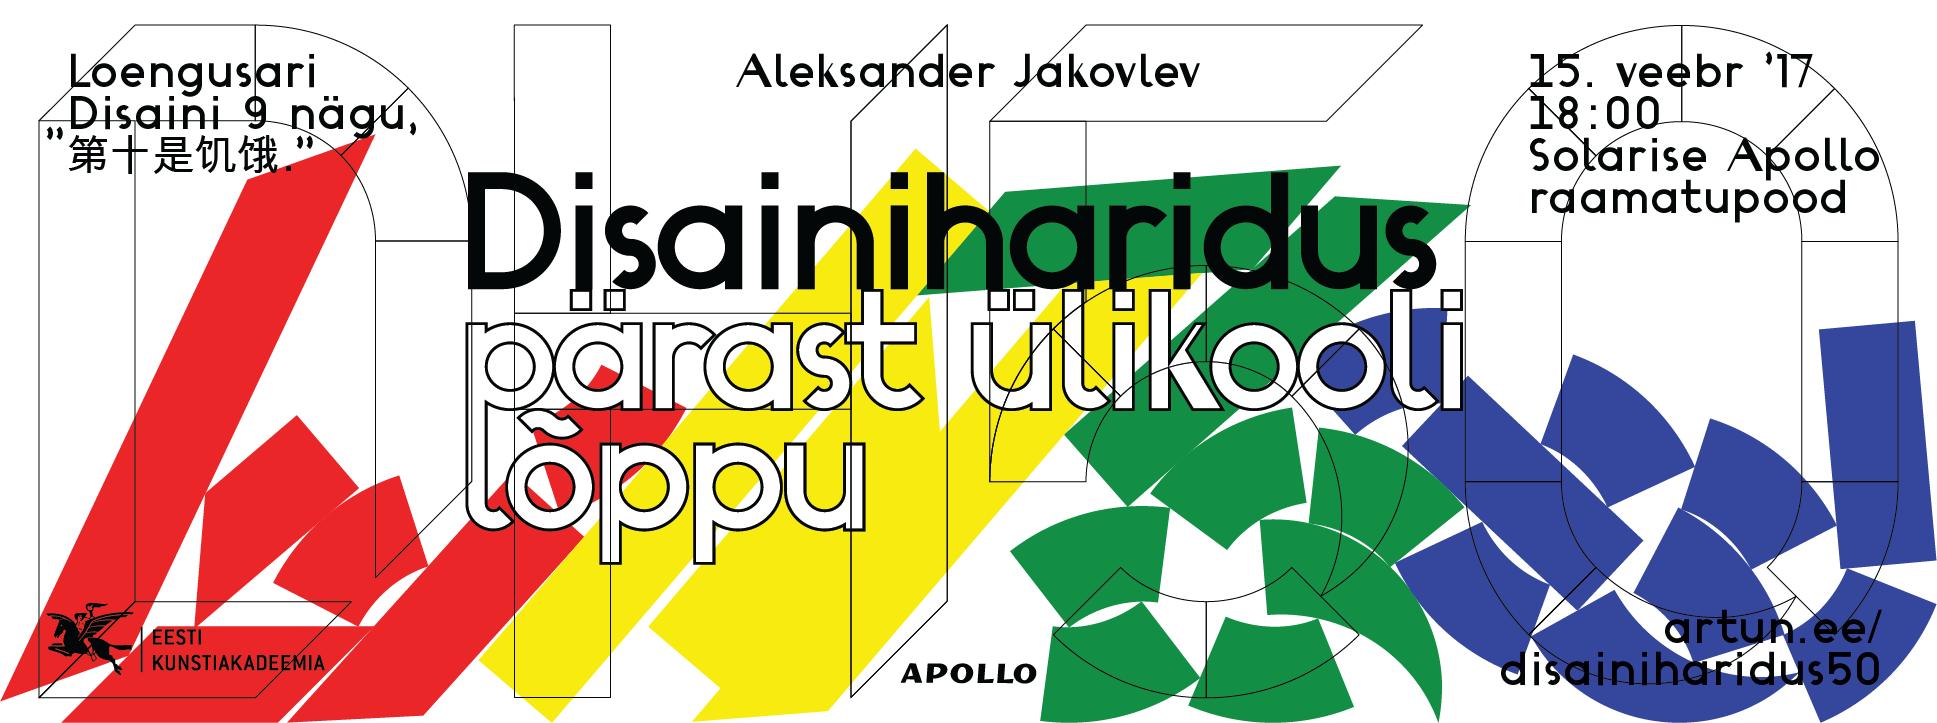 Design by Aimur Takk